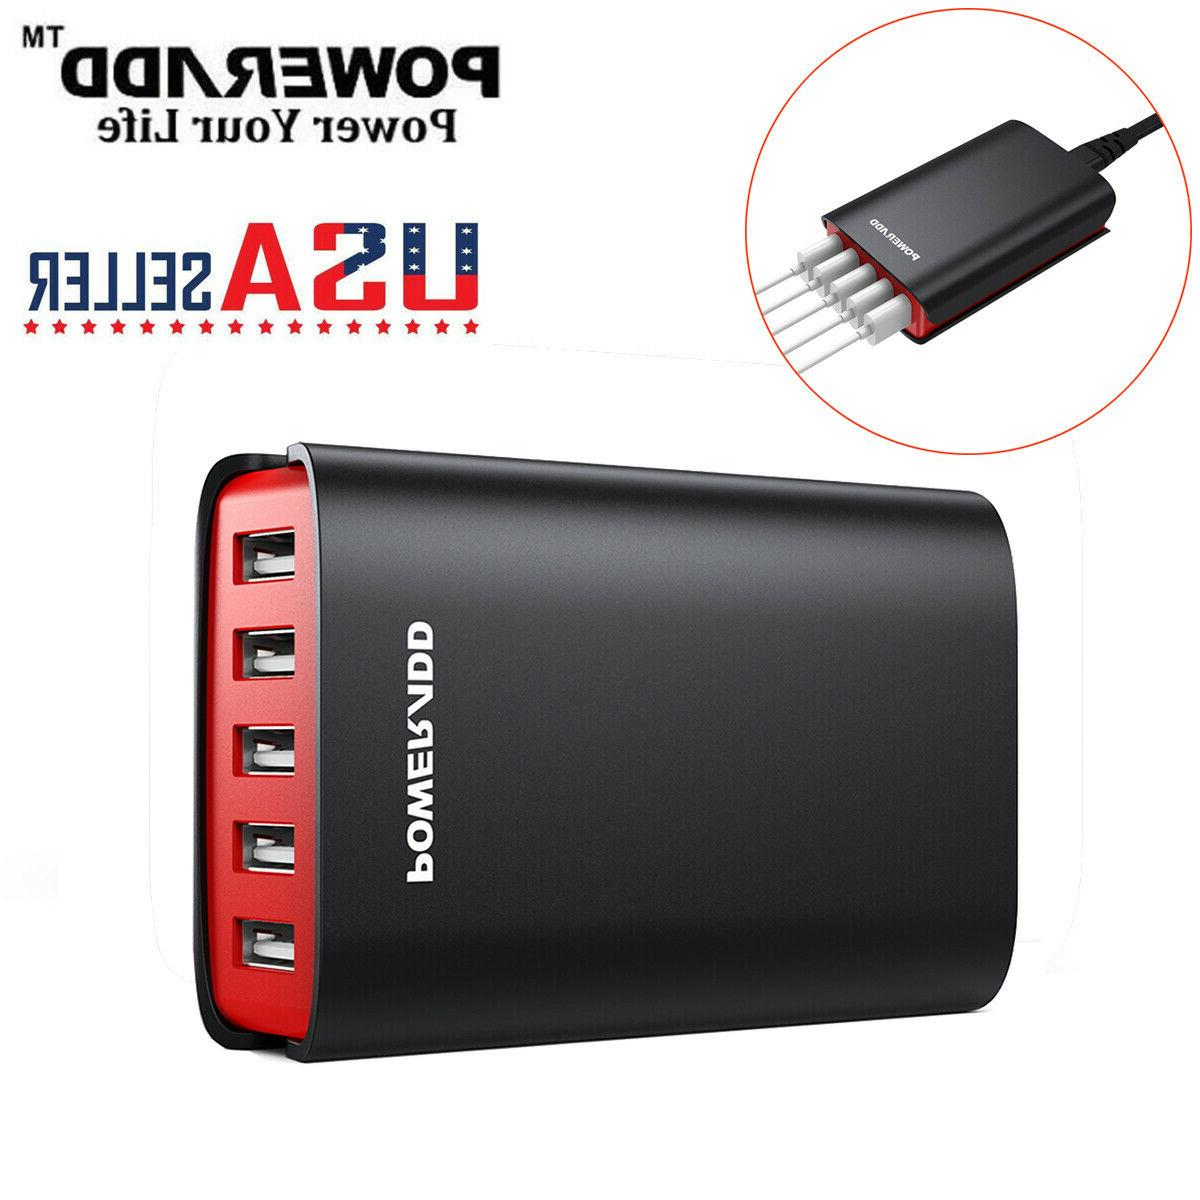 40w 8a 5 ports usb charger hub